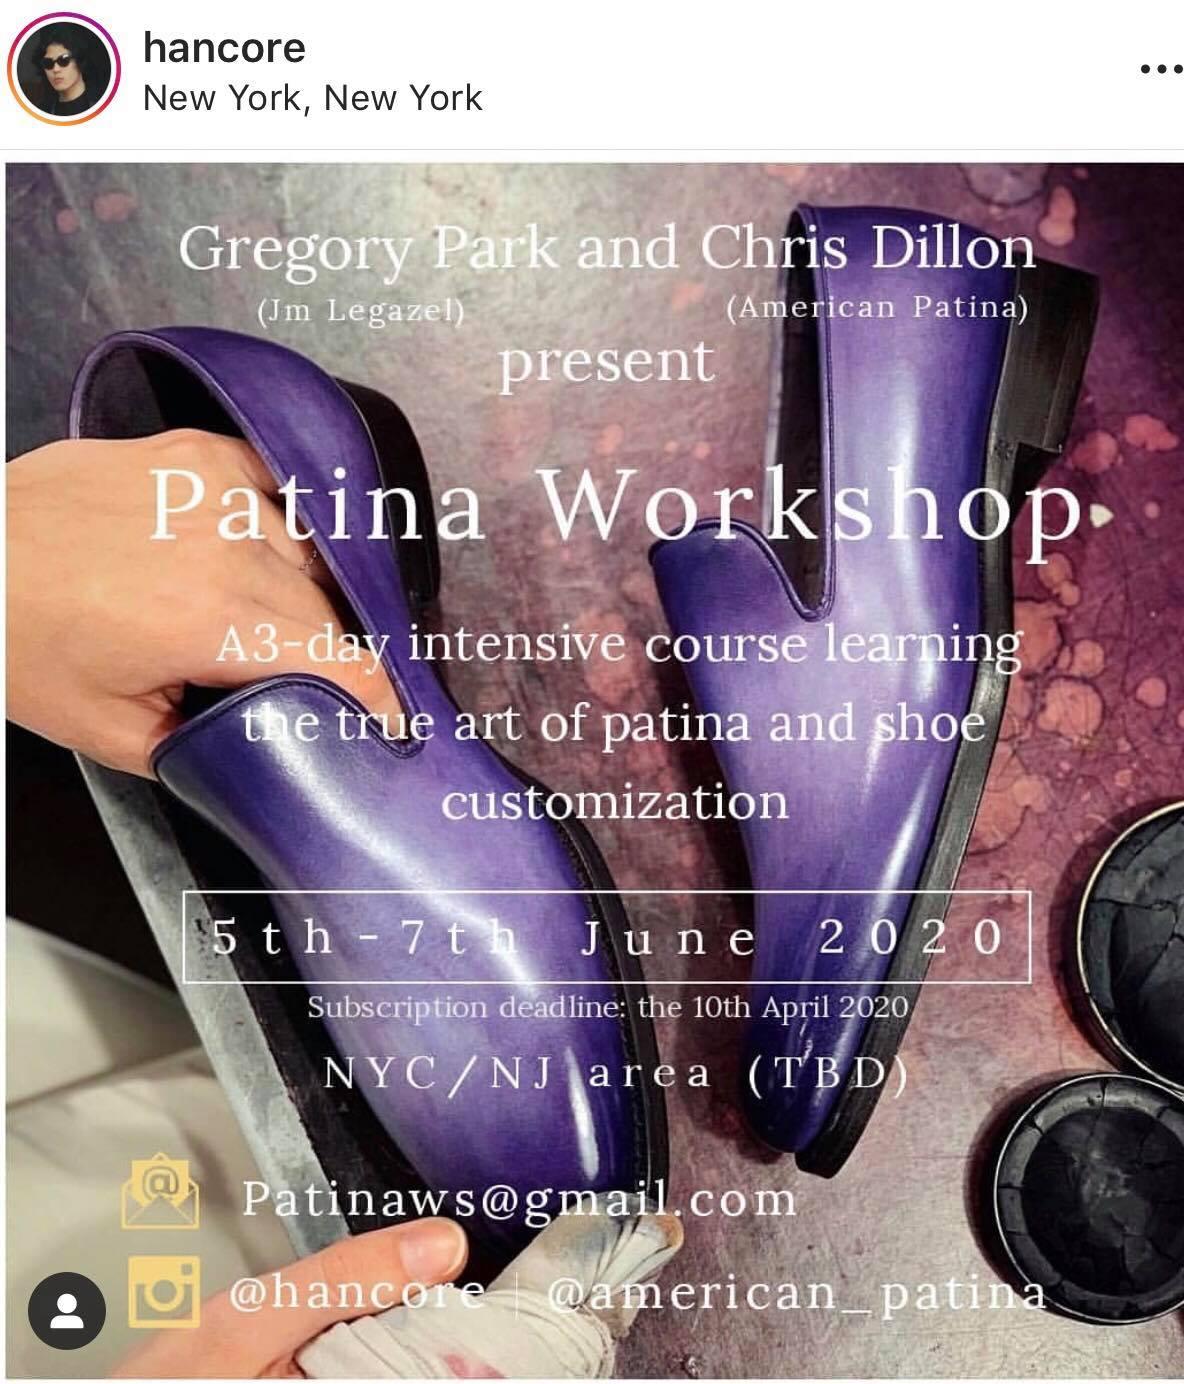 welted shoe news january 2020 - Greg Park Patina Workshop